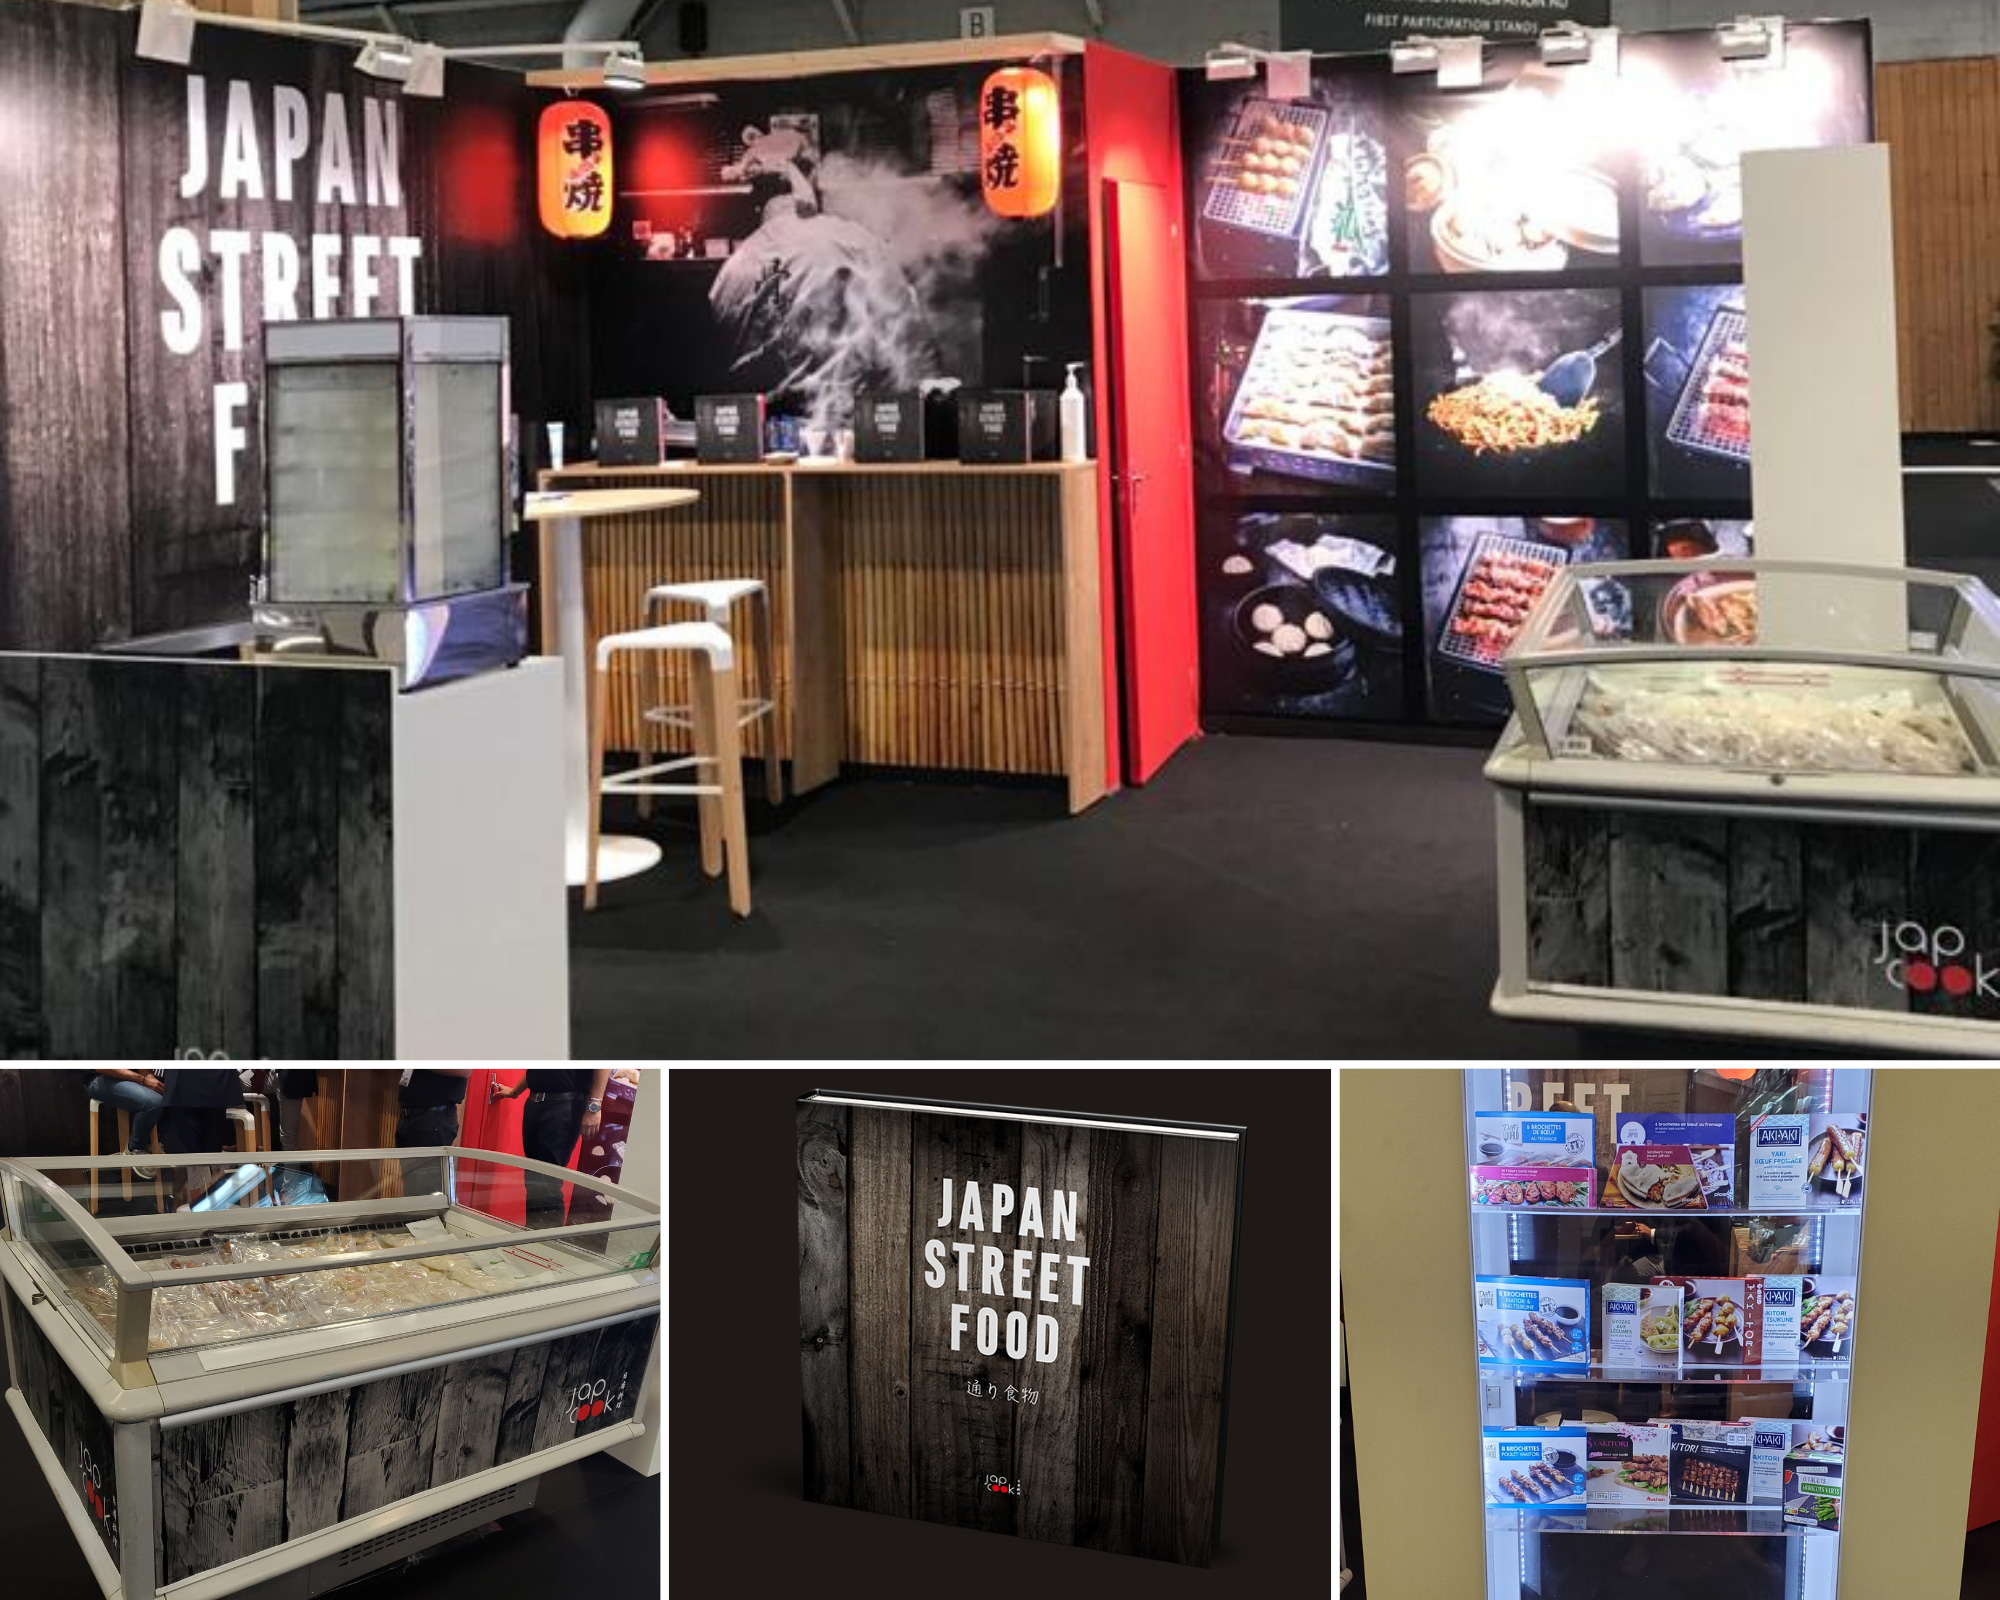 Japan Street Food au M.A.D.E !